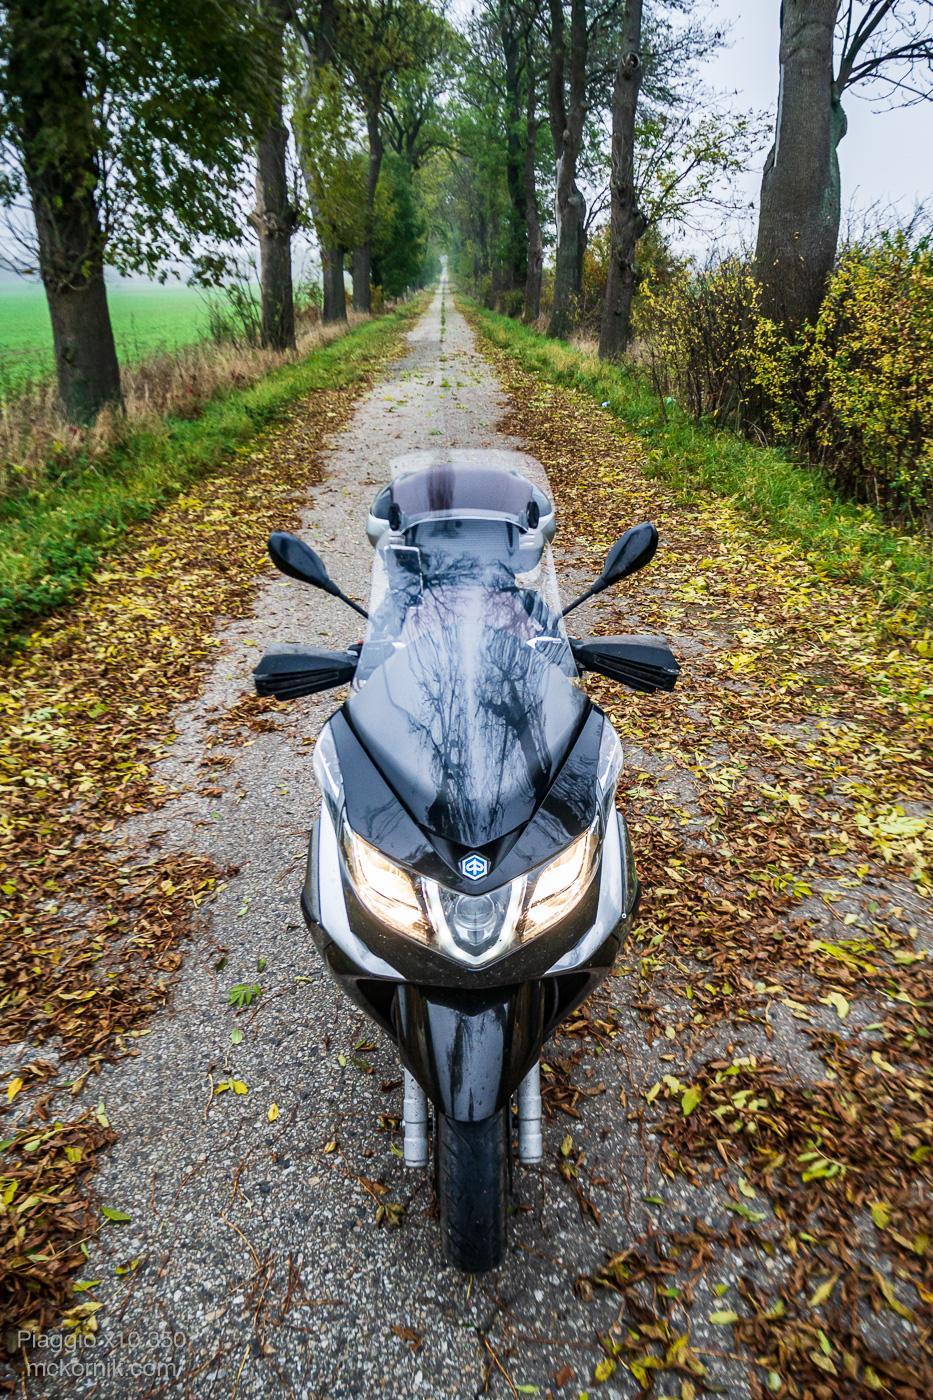 #Calimoto, #Calimotour,  jazda skuterem Piaggio x10, #piaggiox10 - fot.